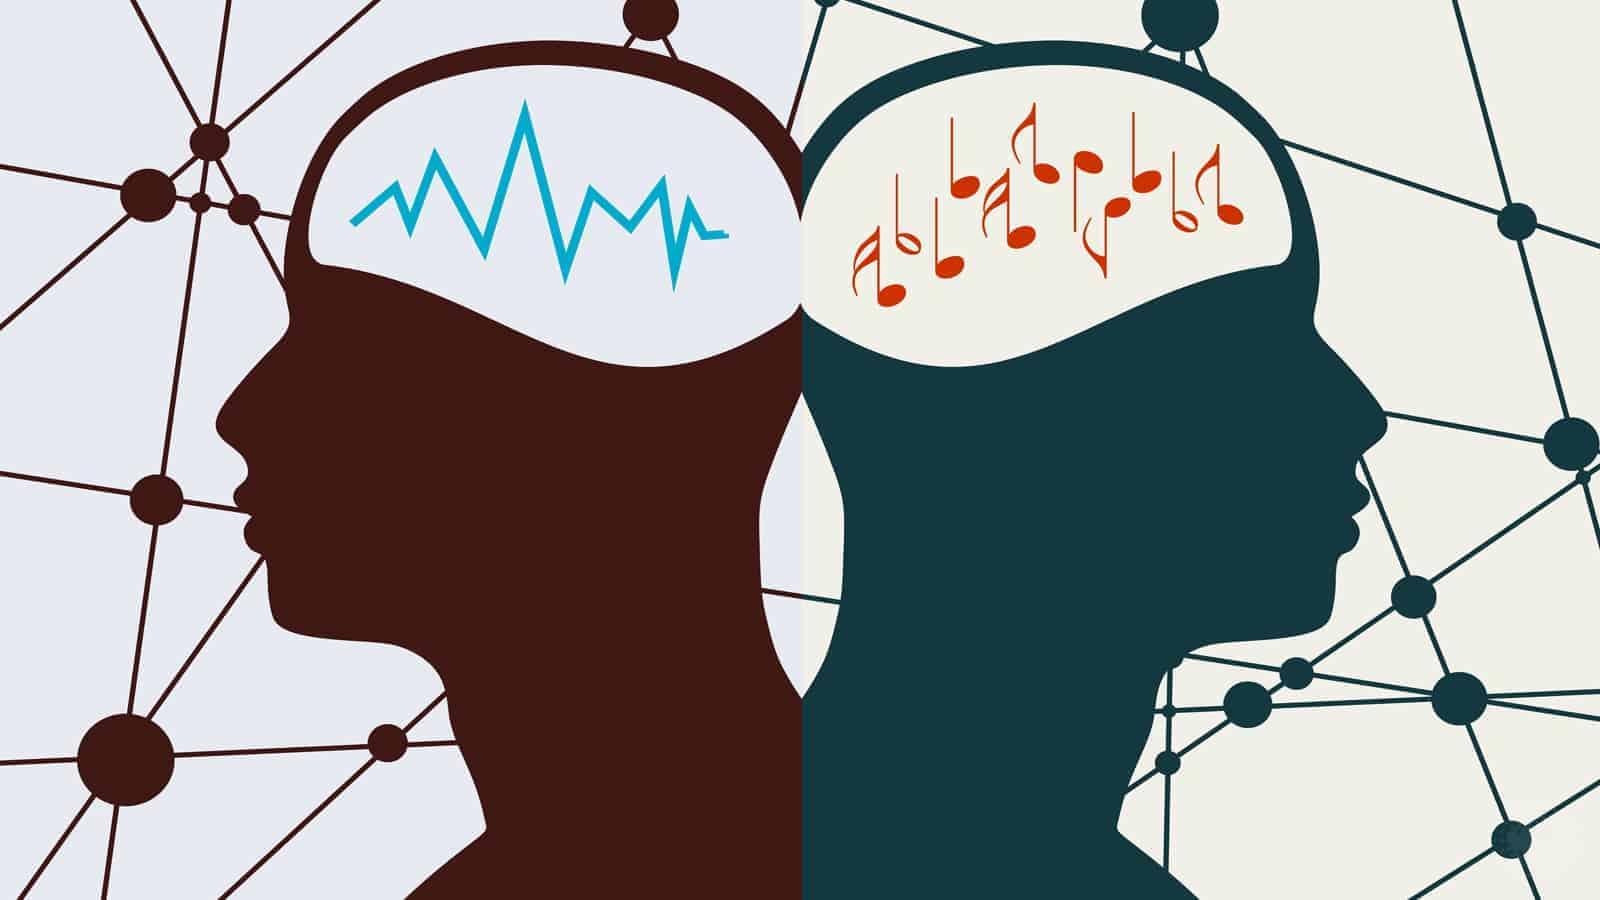 music influences mood